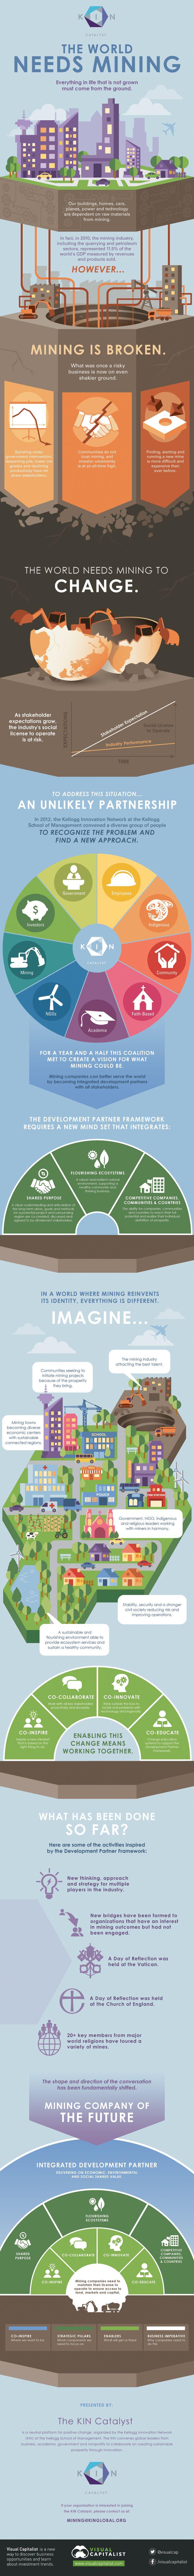 Unique Infographic Design, A New Vision for the Mining Company of the Future via @claudioc #Infographic #Design